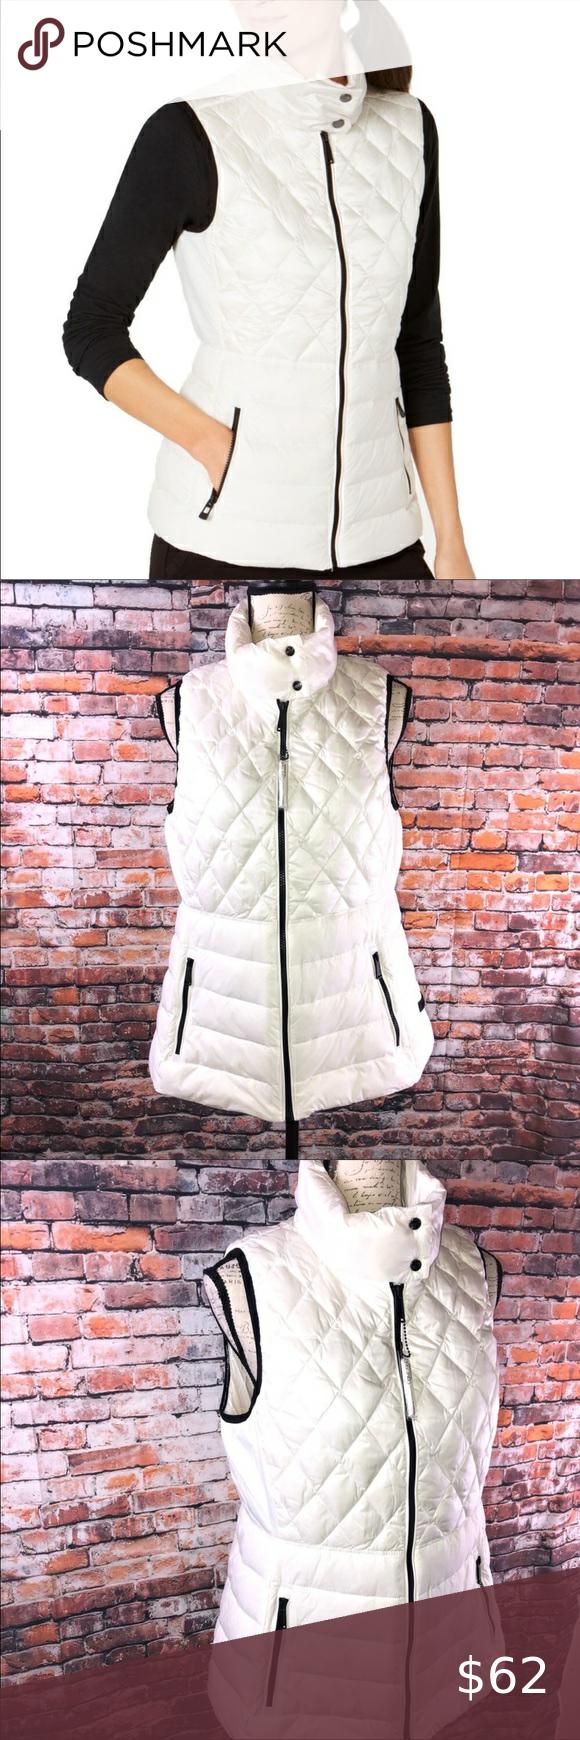 Calvin Klein Performance White Down Puffer Vest L White Puffer Vest Calvin Klein Clothes Design [ 1740 x 580 Pixel ]